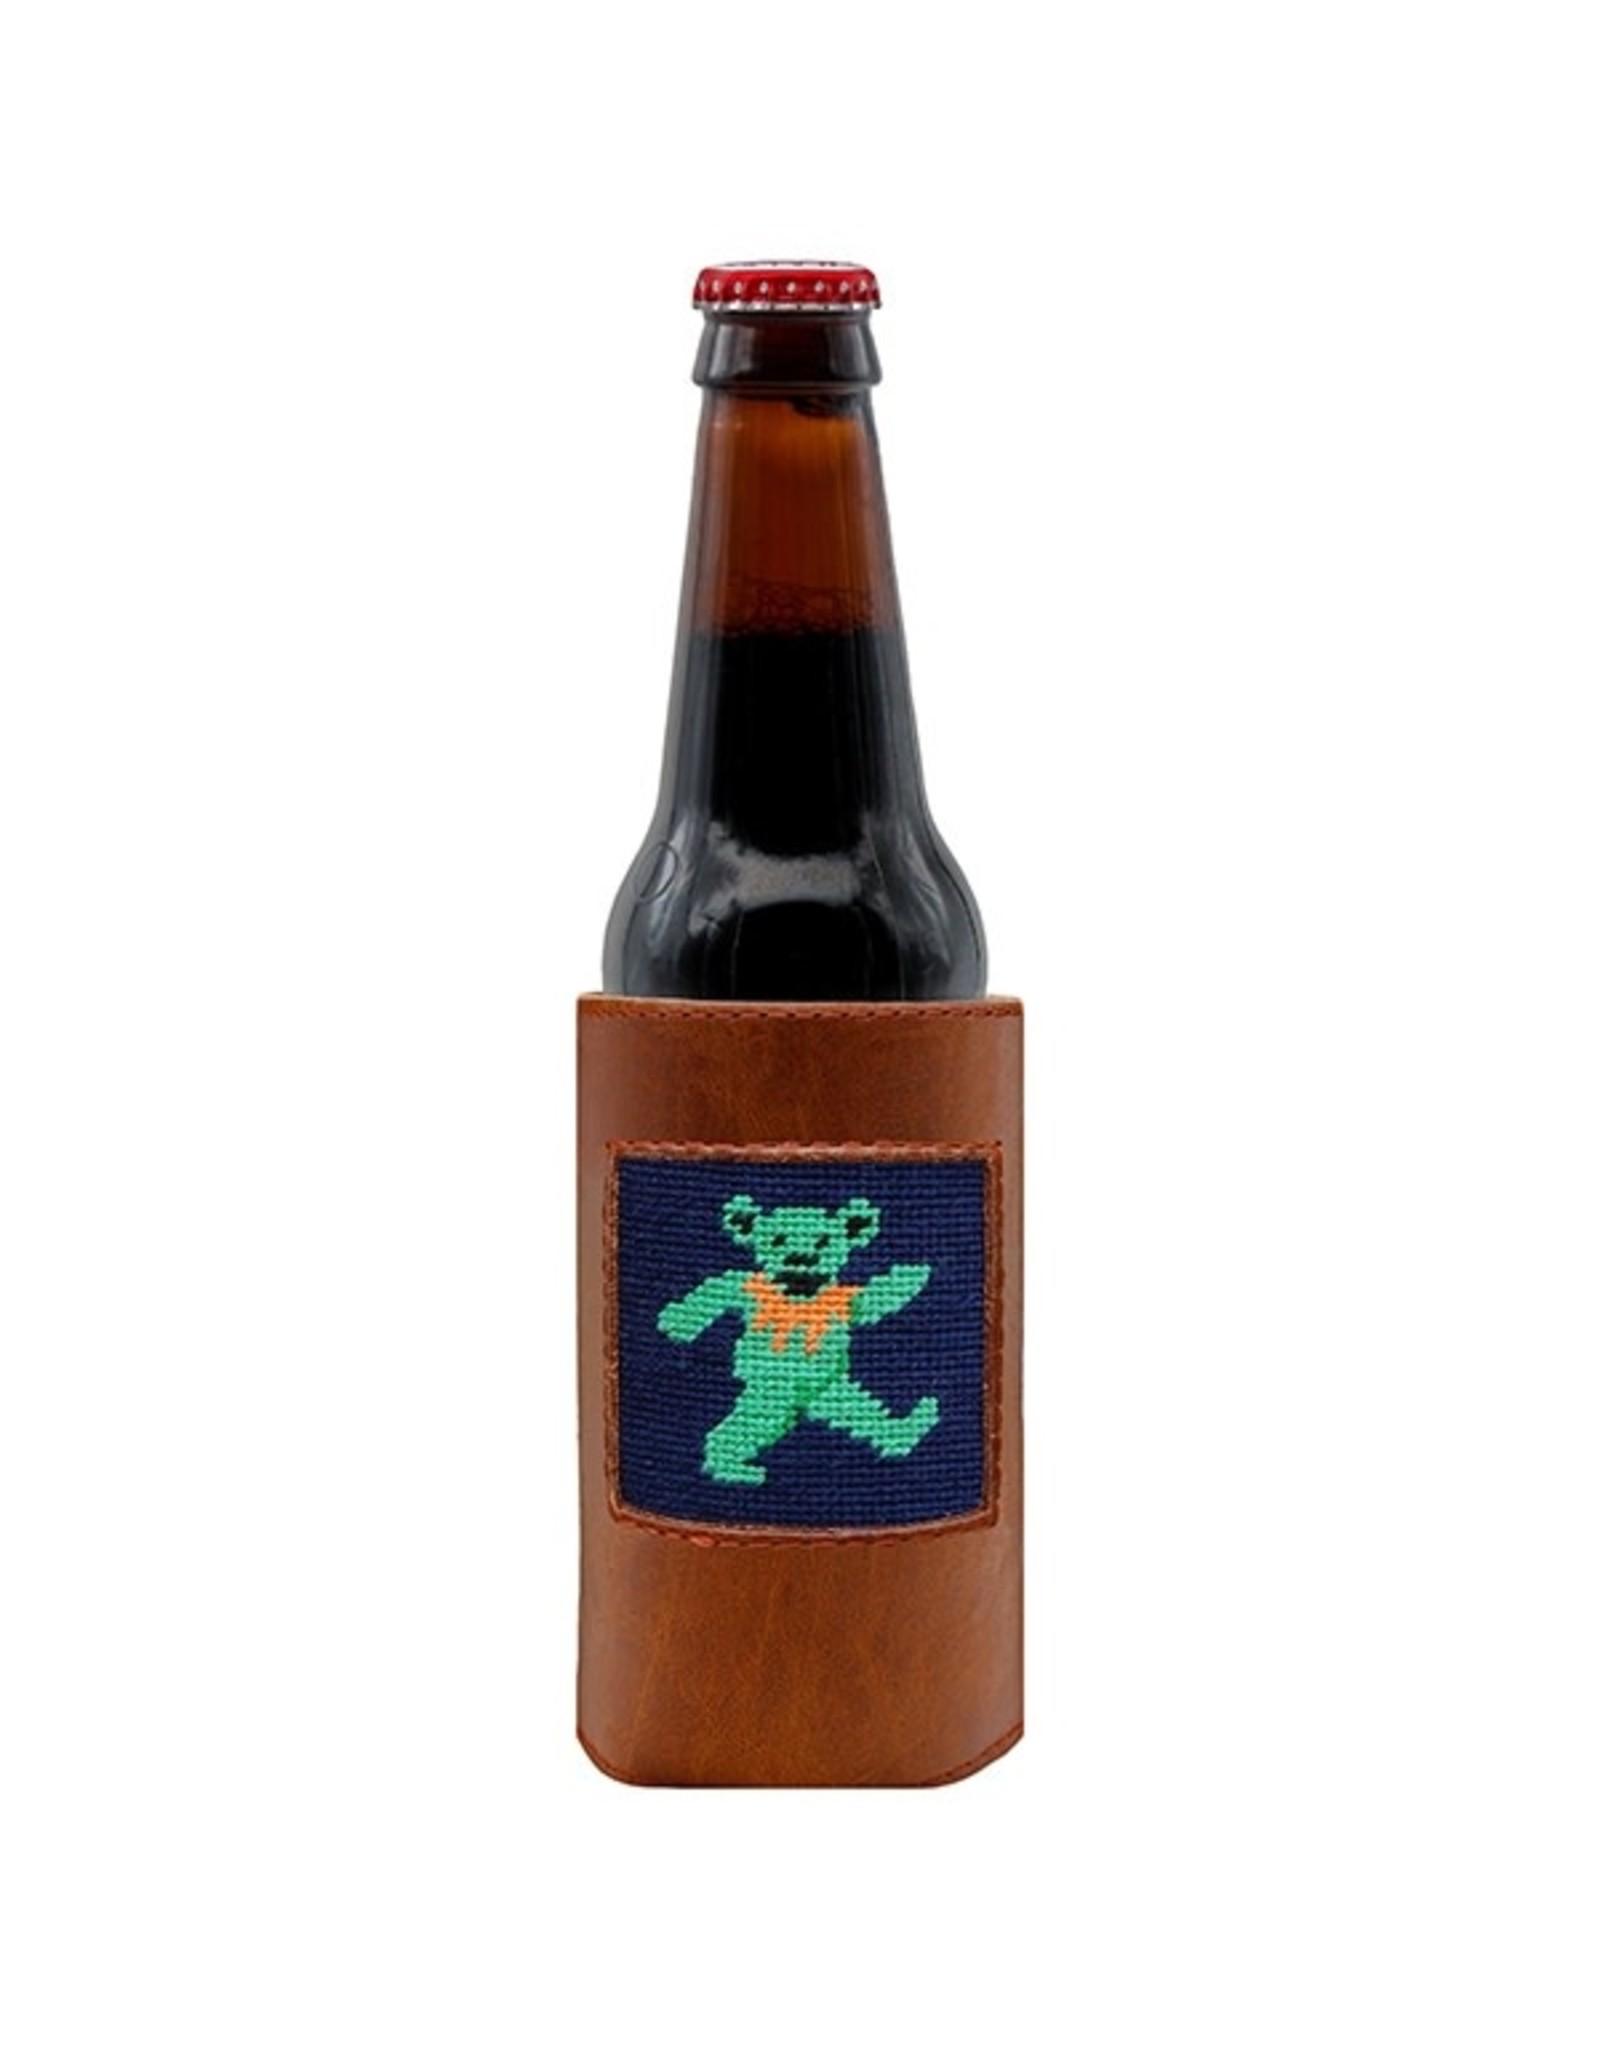 Smathers & Branson S&B Needlepoint Bottle Cooler, Dancing Bear